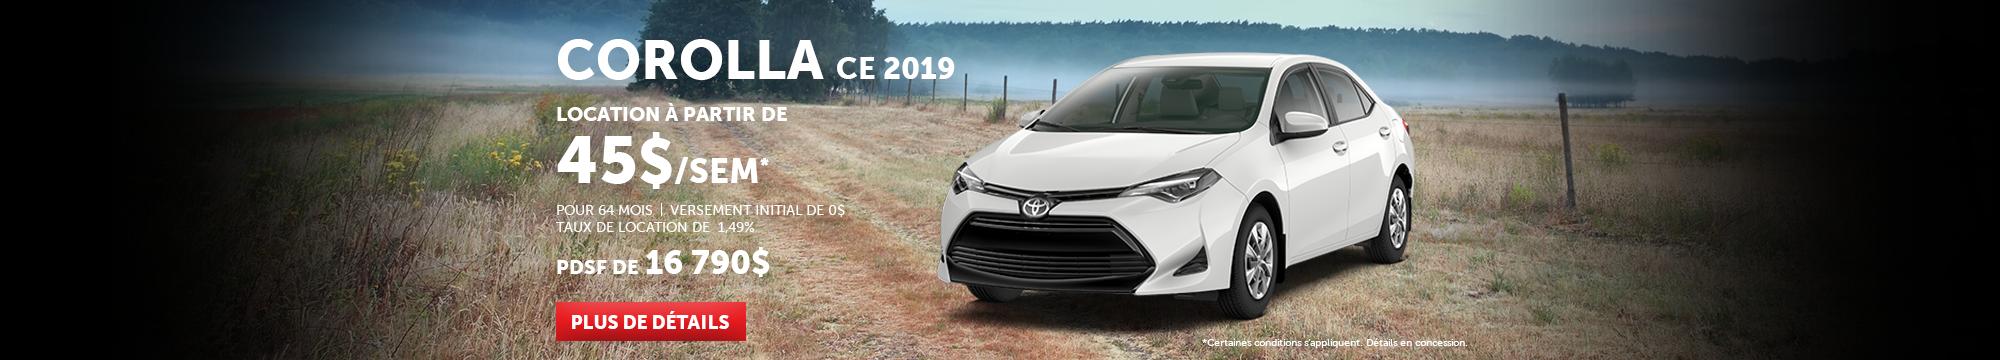 Corolla CE 2019